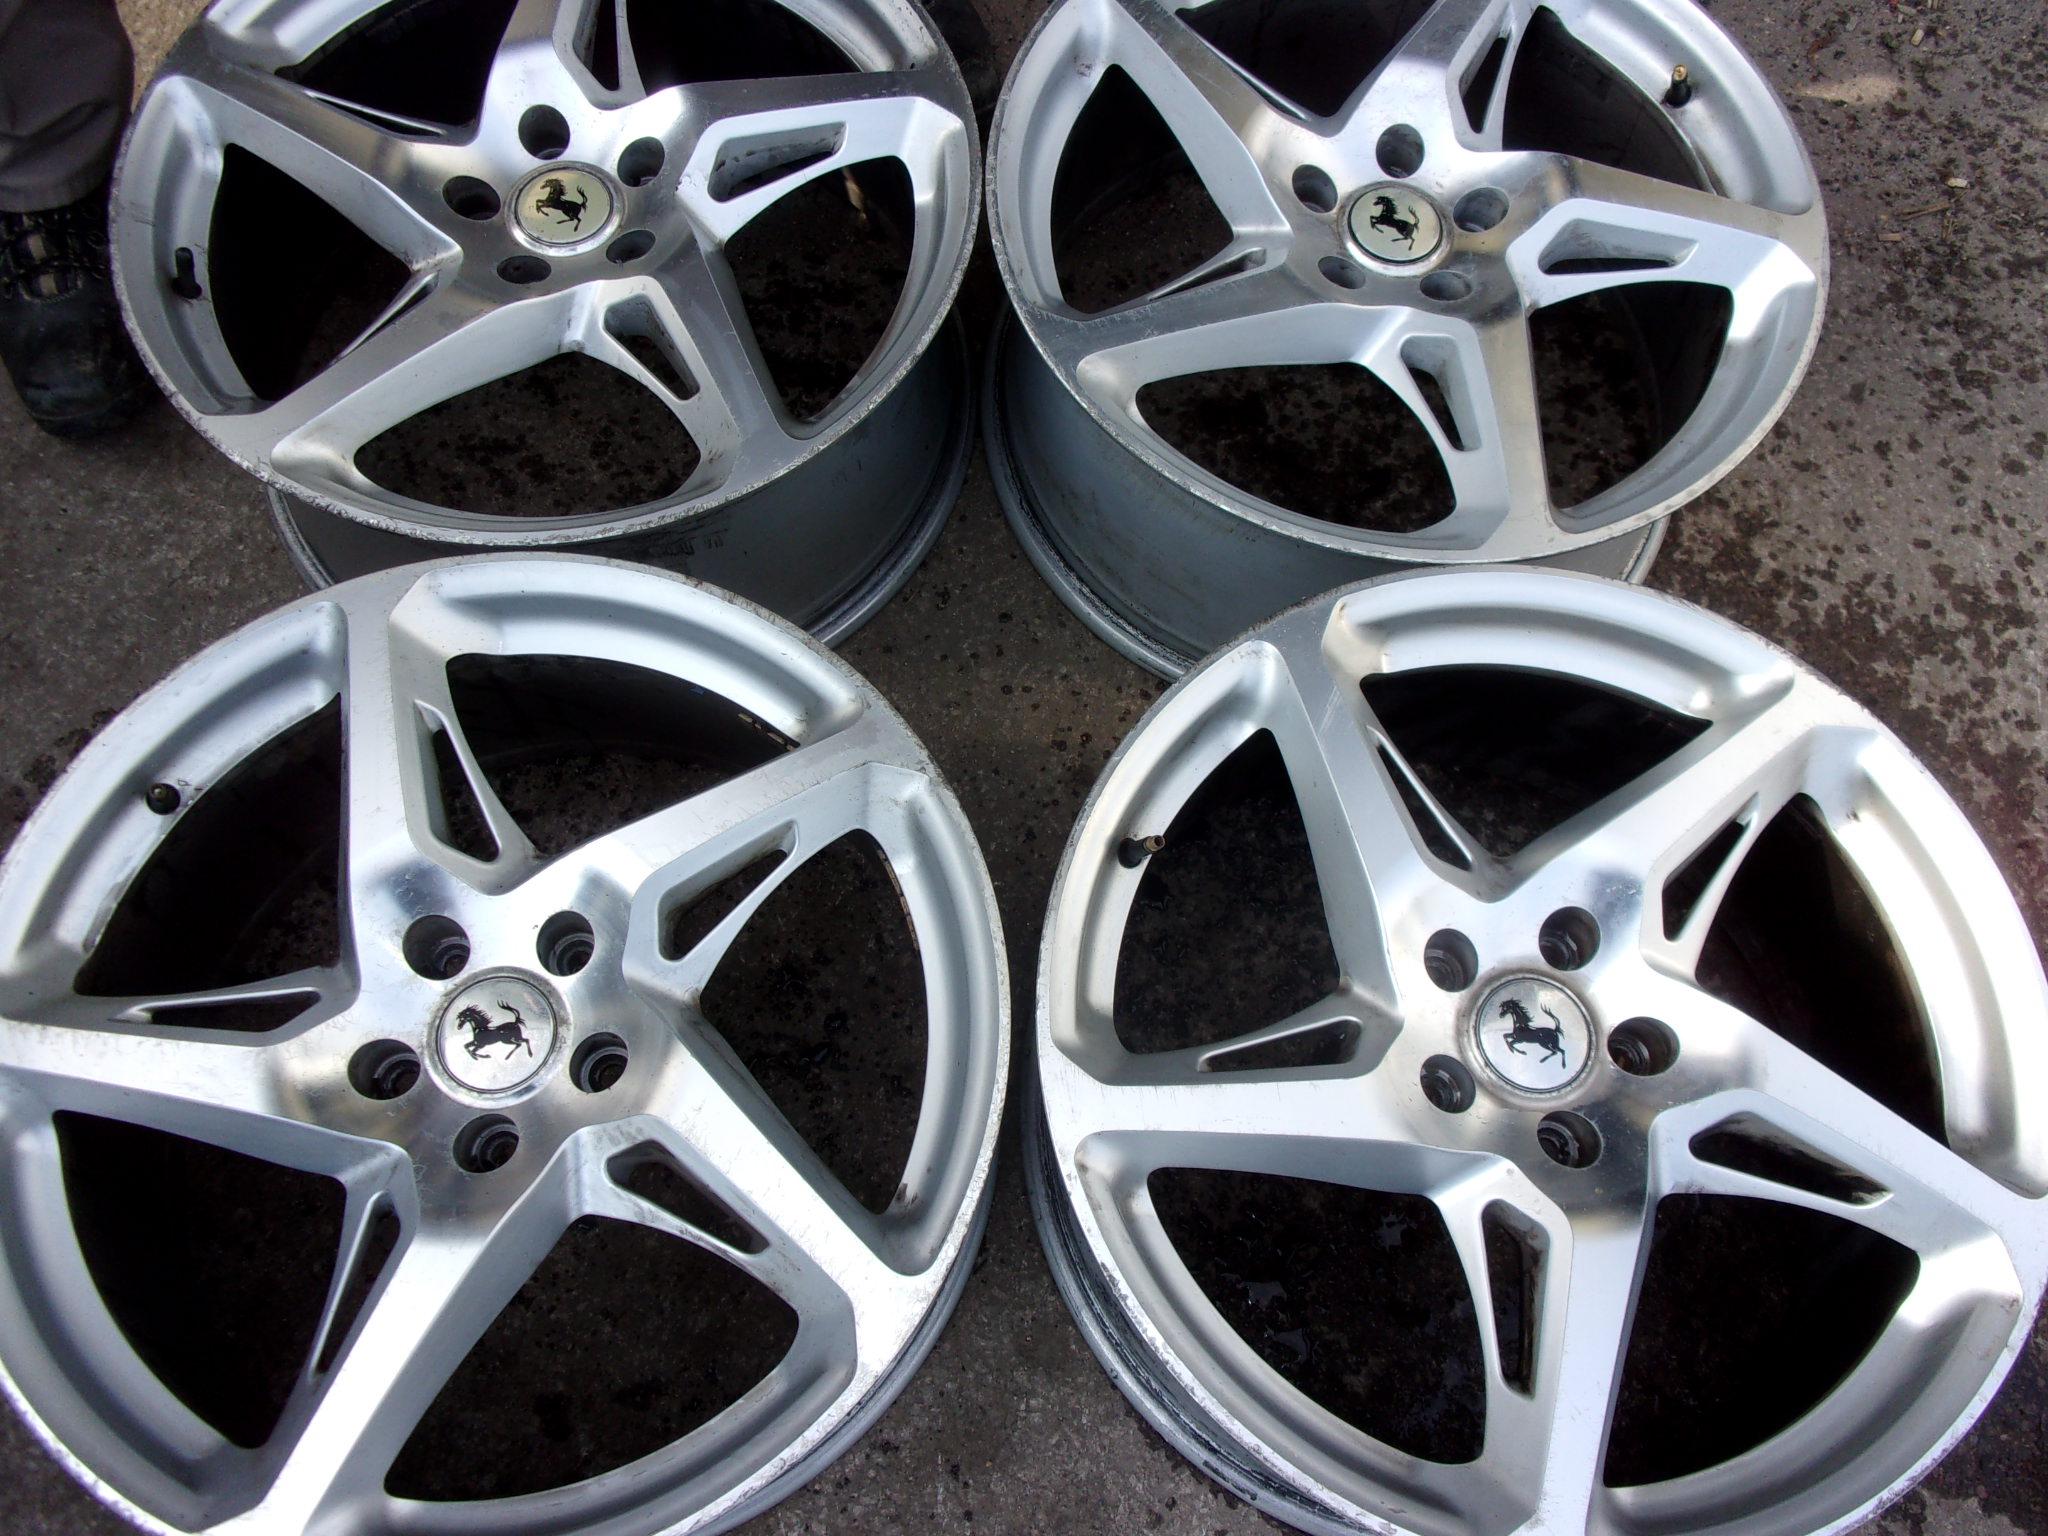 19 Ferrari 458 Style Alloy Wheels New Tyres Performance Wheels And Tyres